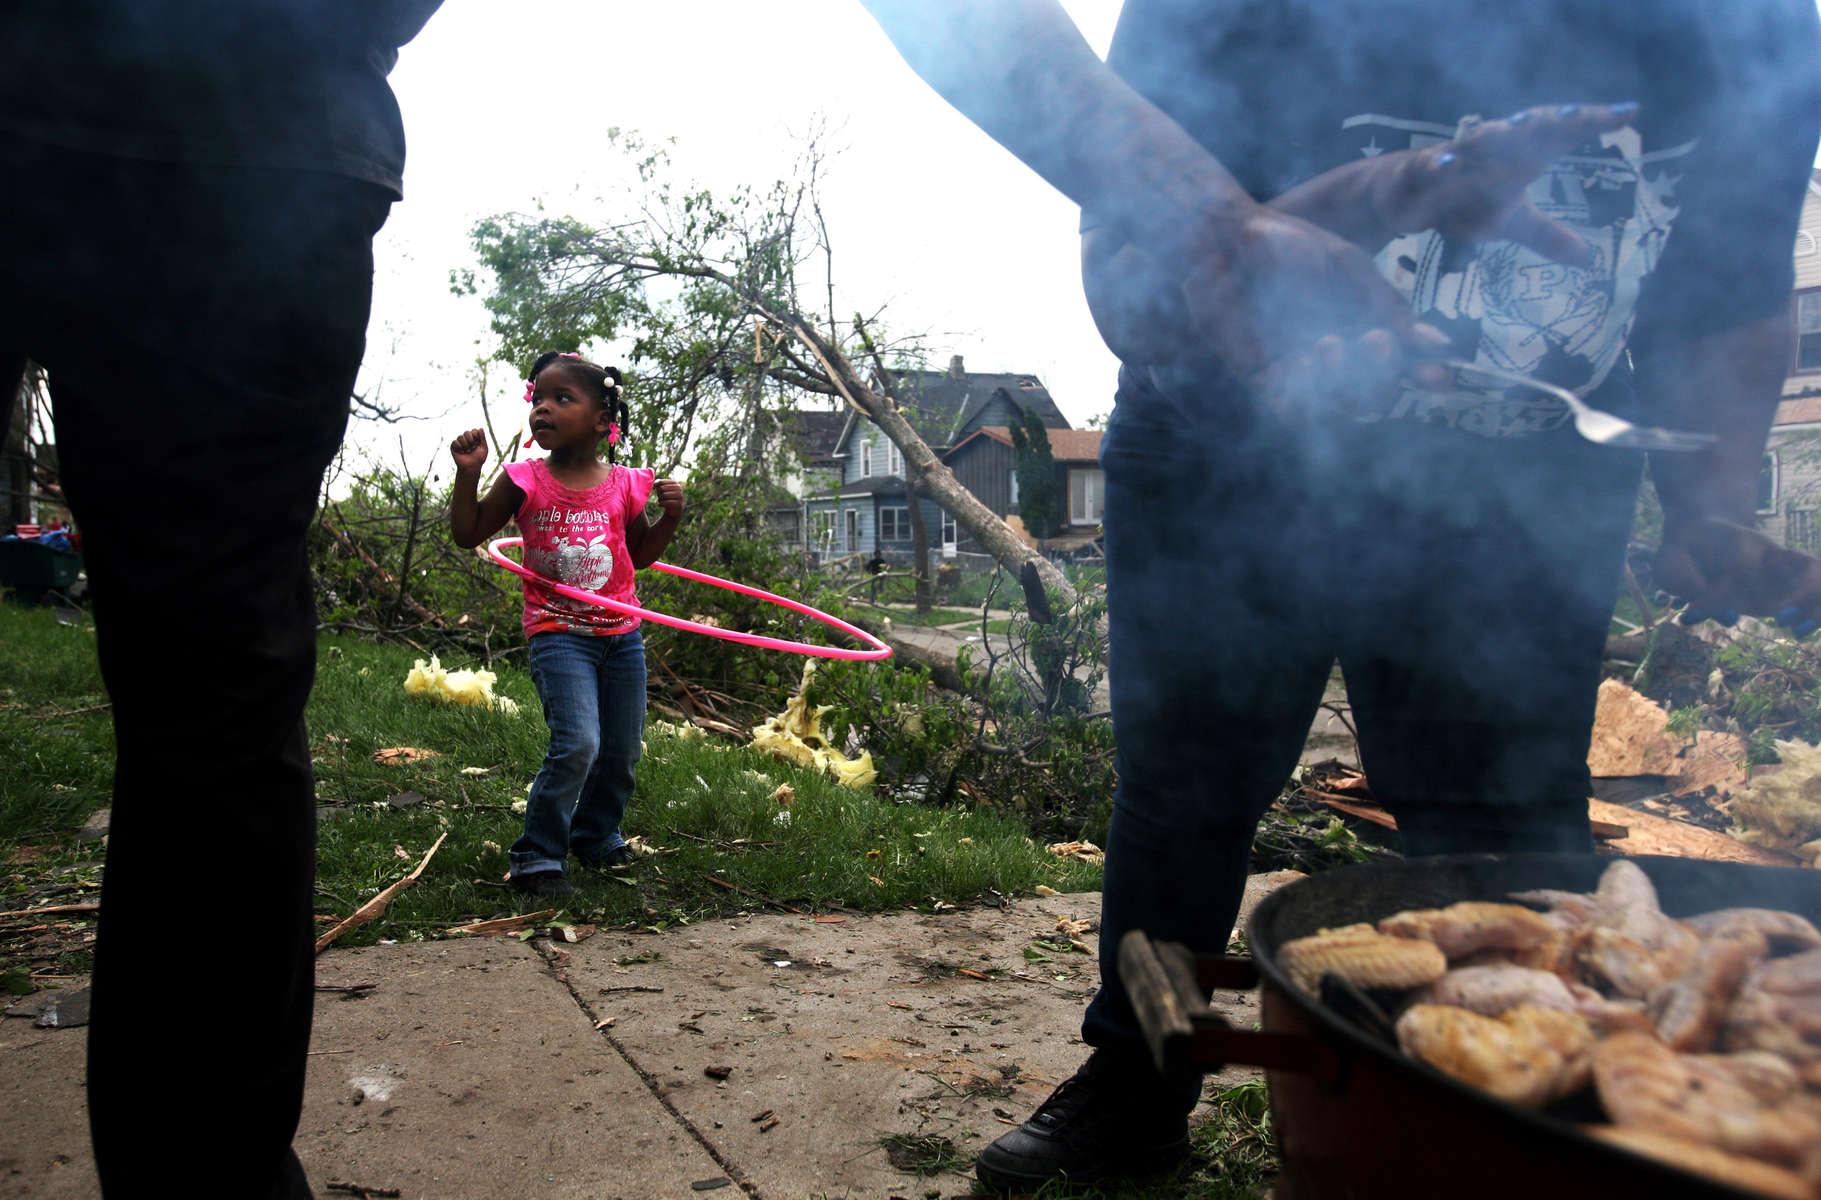 Following a devastating tornado, Laneik White, 4, plays with a hoola hoop as neighbors grill food for their community in Minneapolis, Minn.